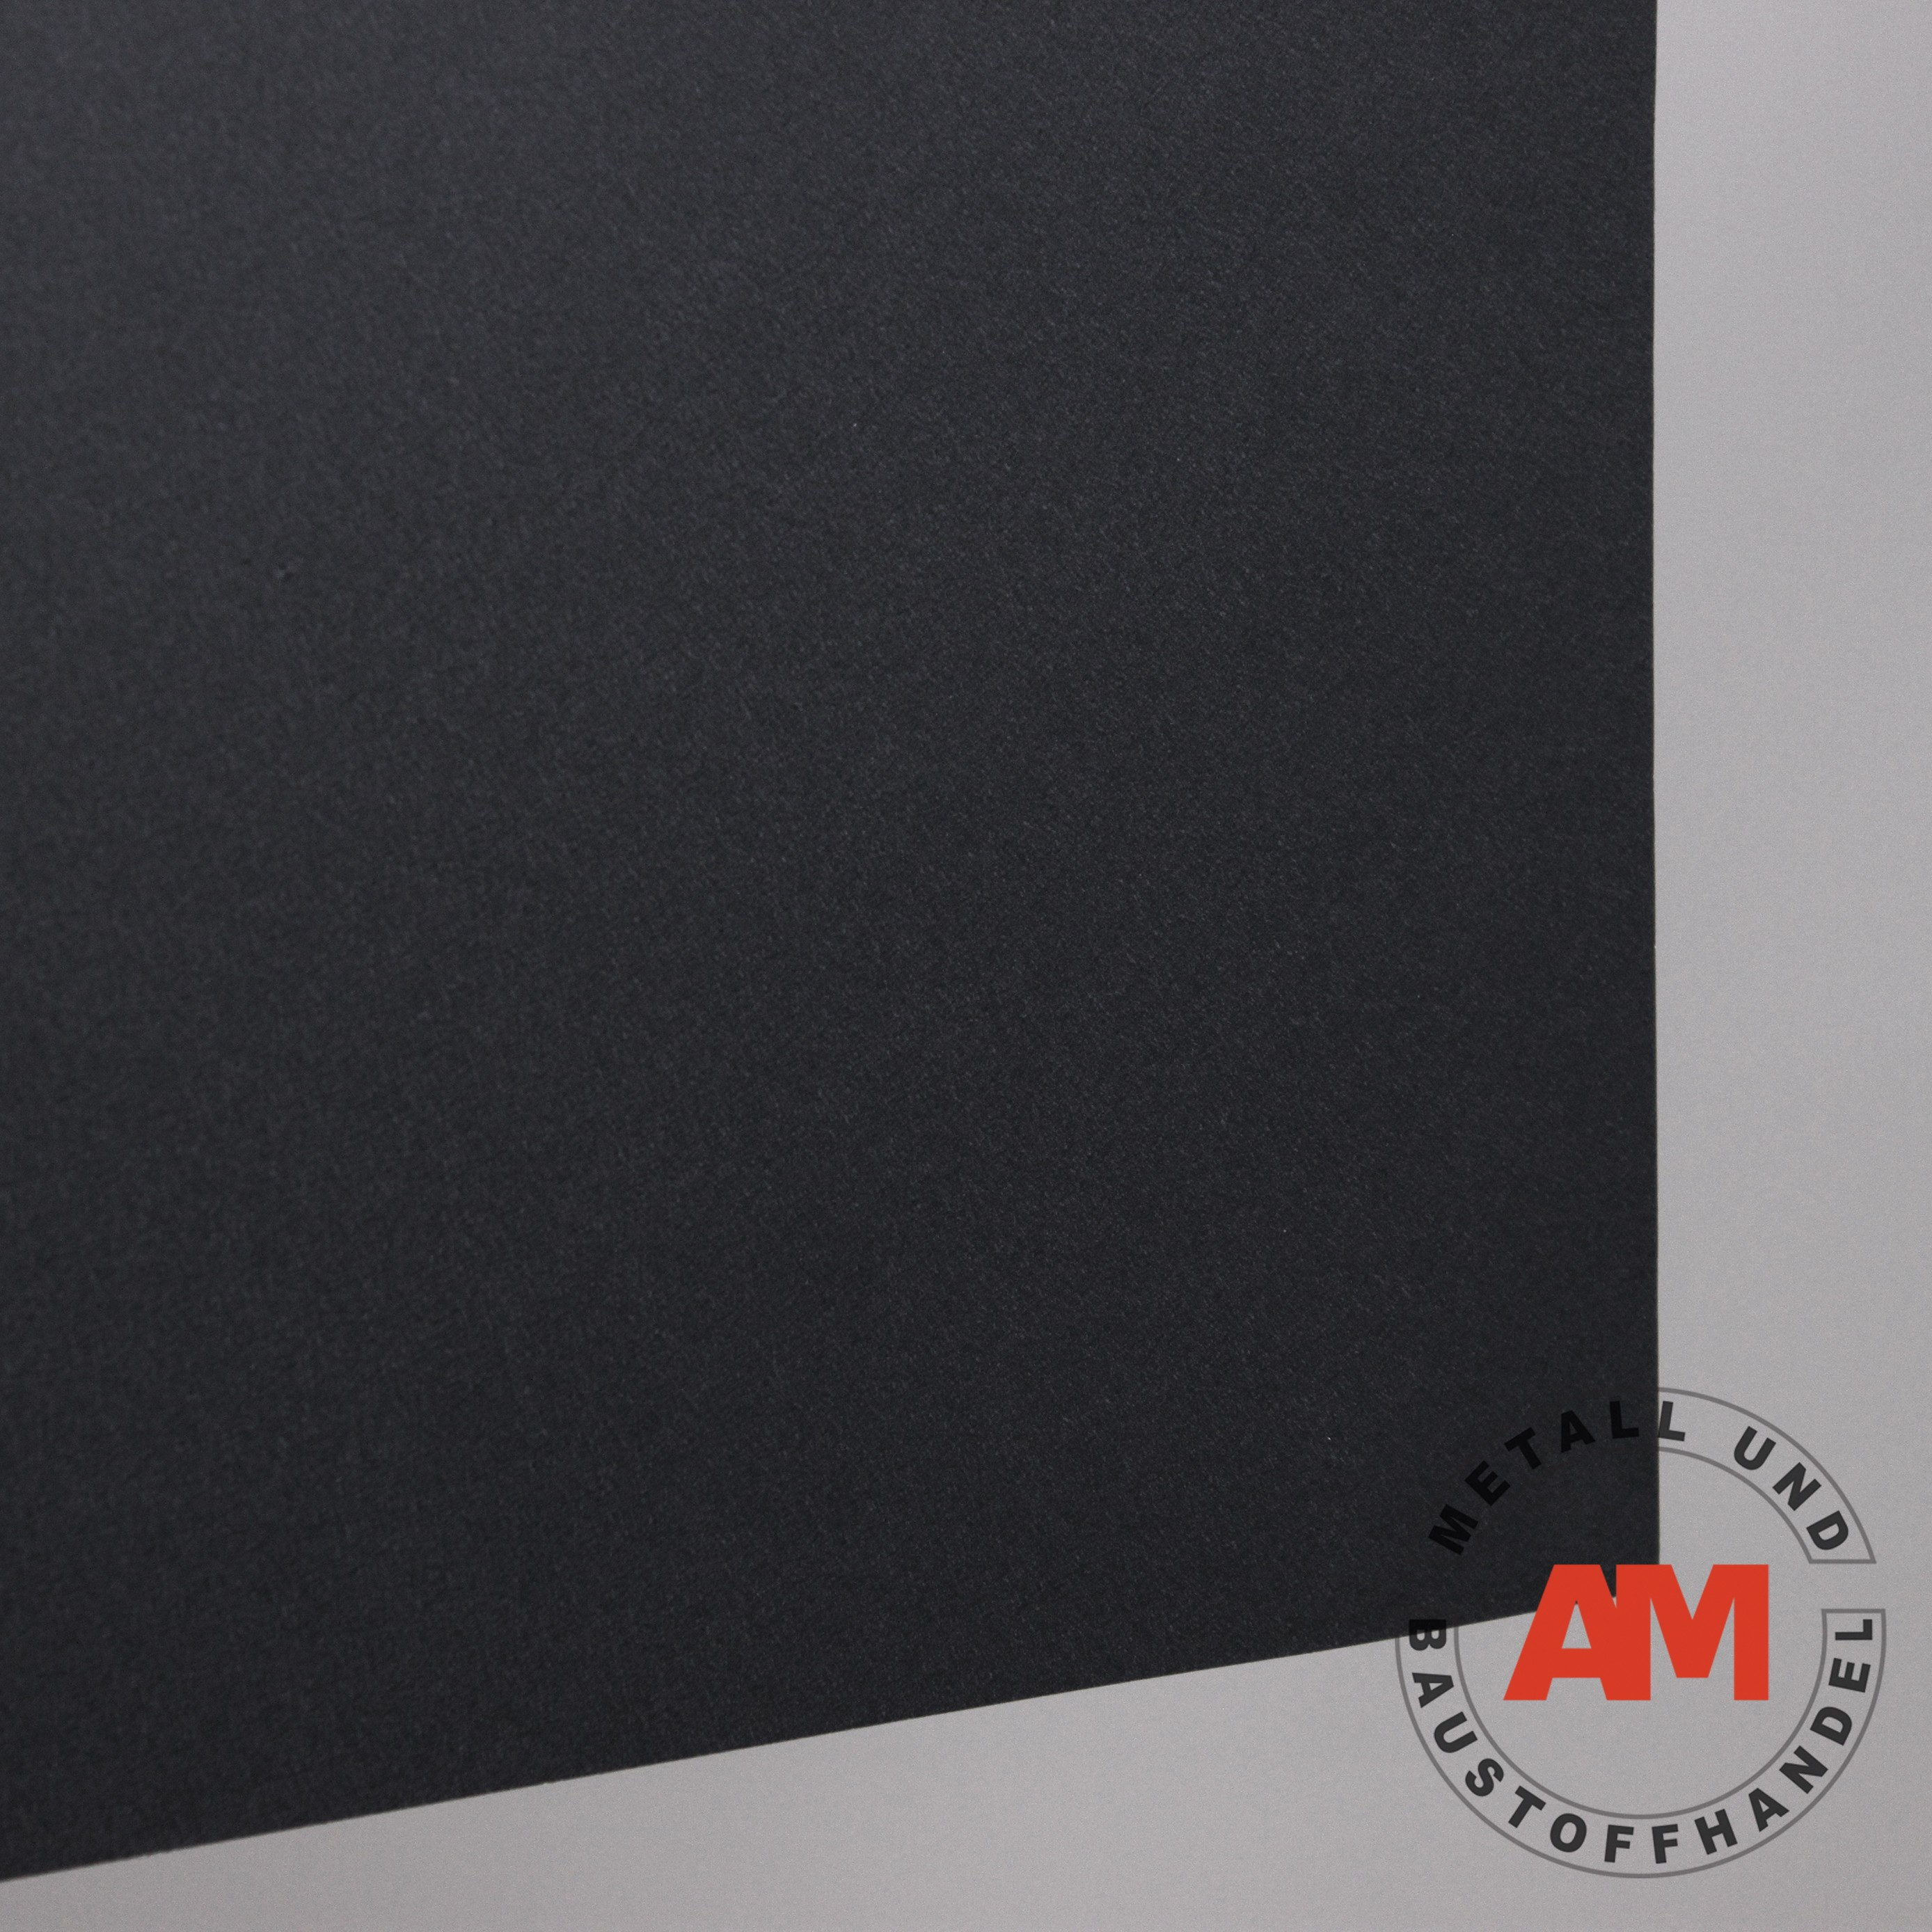 Alu Blech Zuschnitt TA-Falz RAL 7016 Anthrazitgrau Aluminium nach Maß